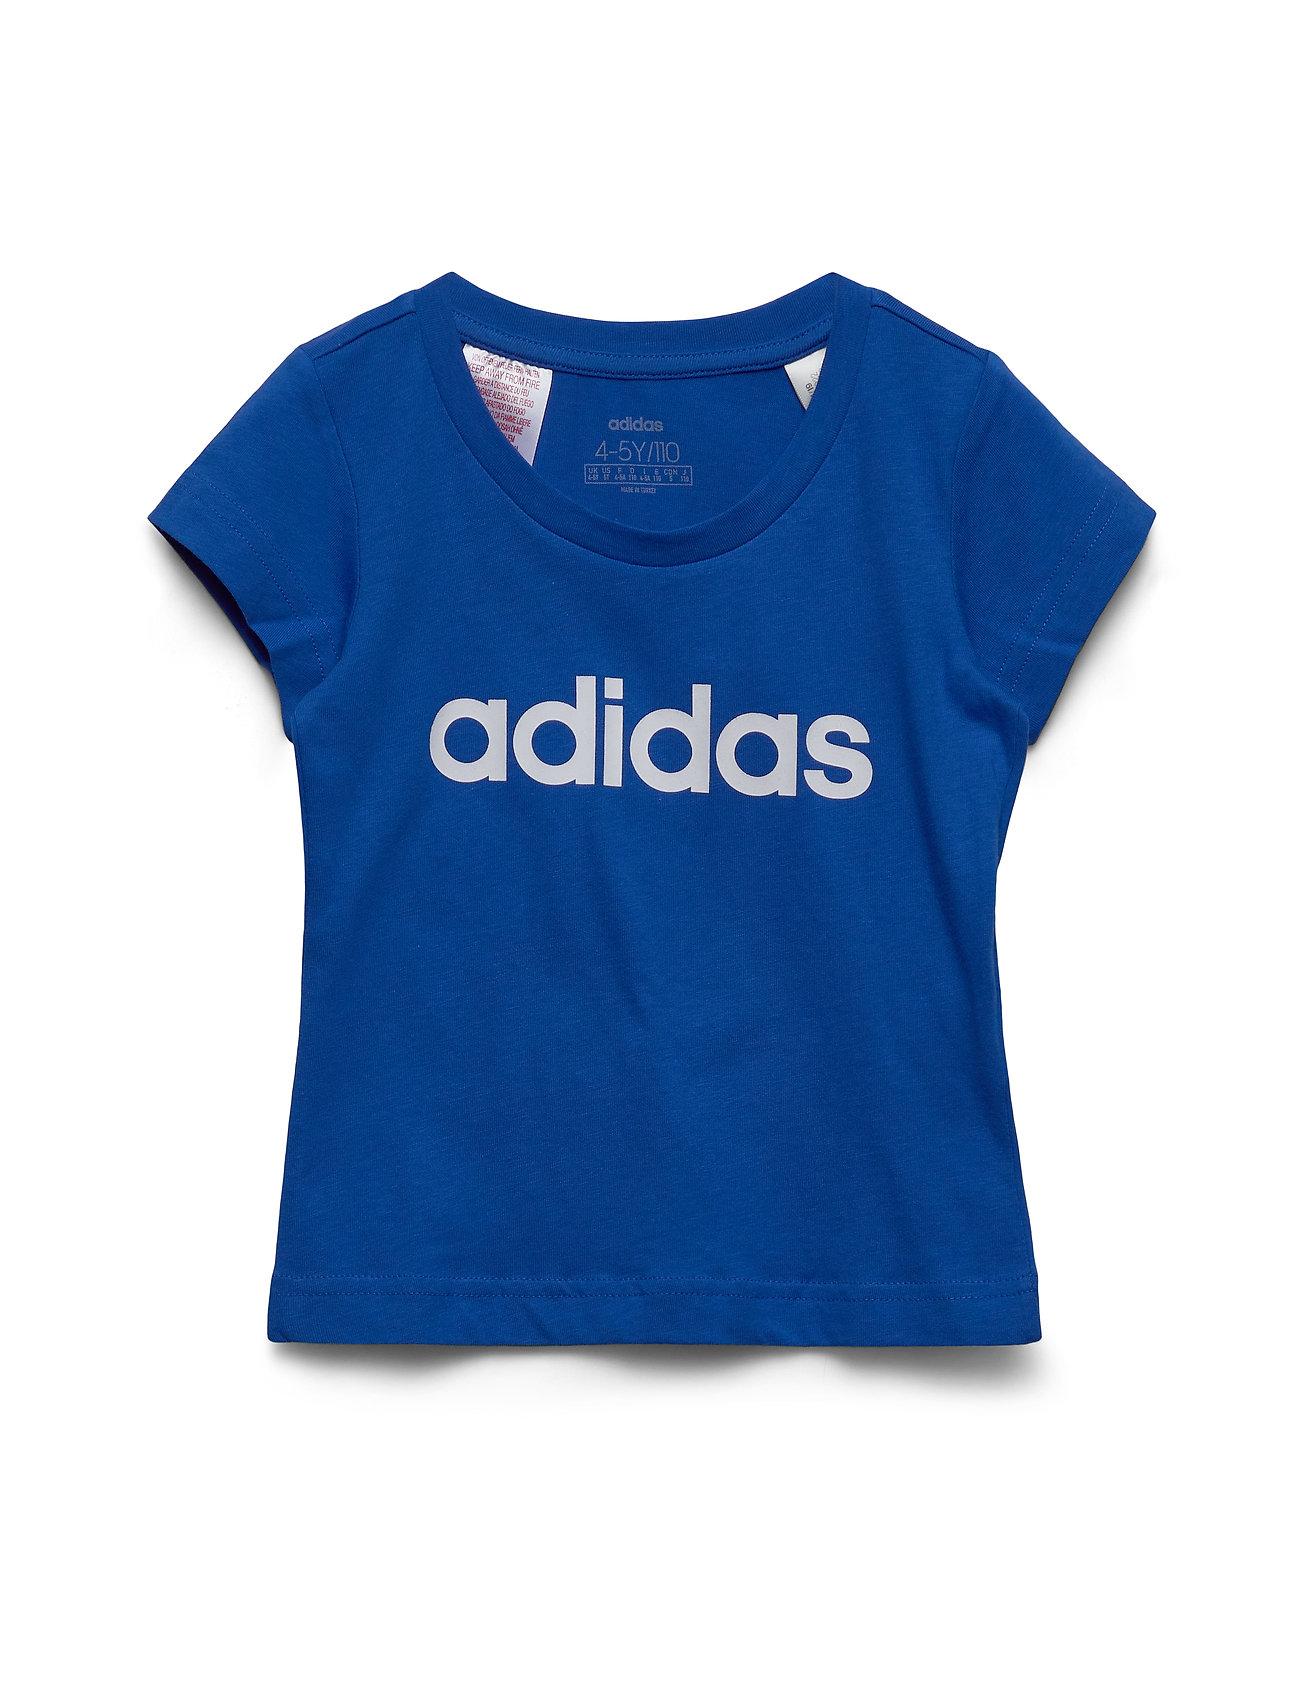 Image of Yg E Lin Tee T-shirt Blå Adidas Performance (3406257285)